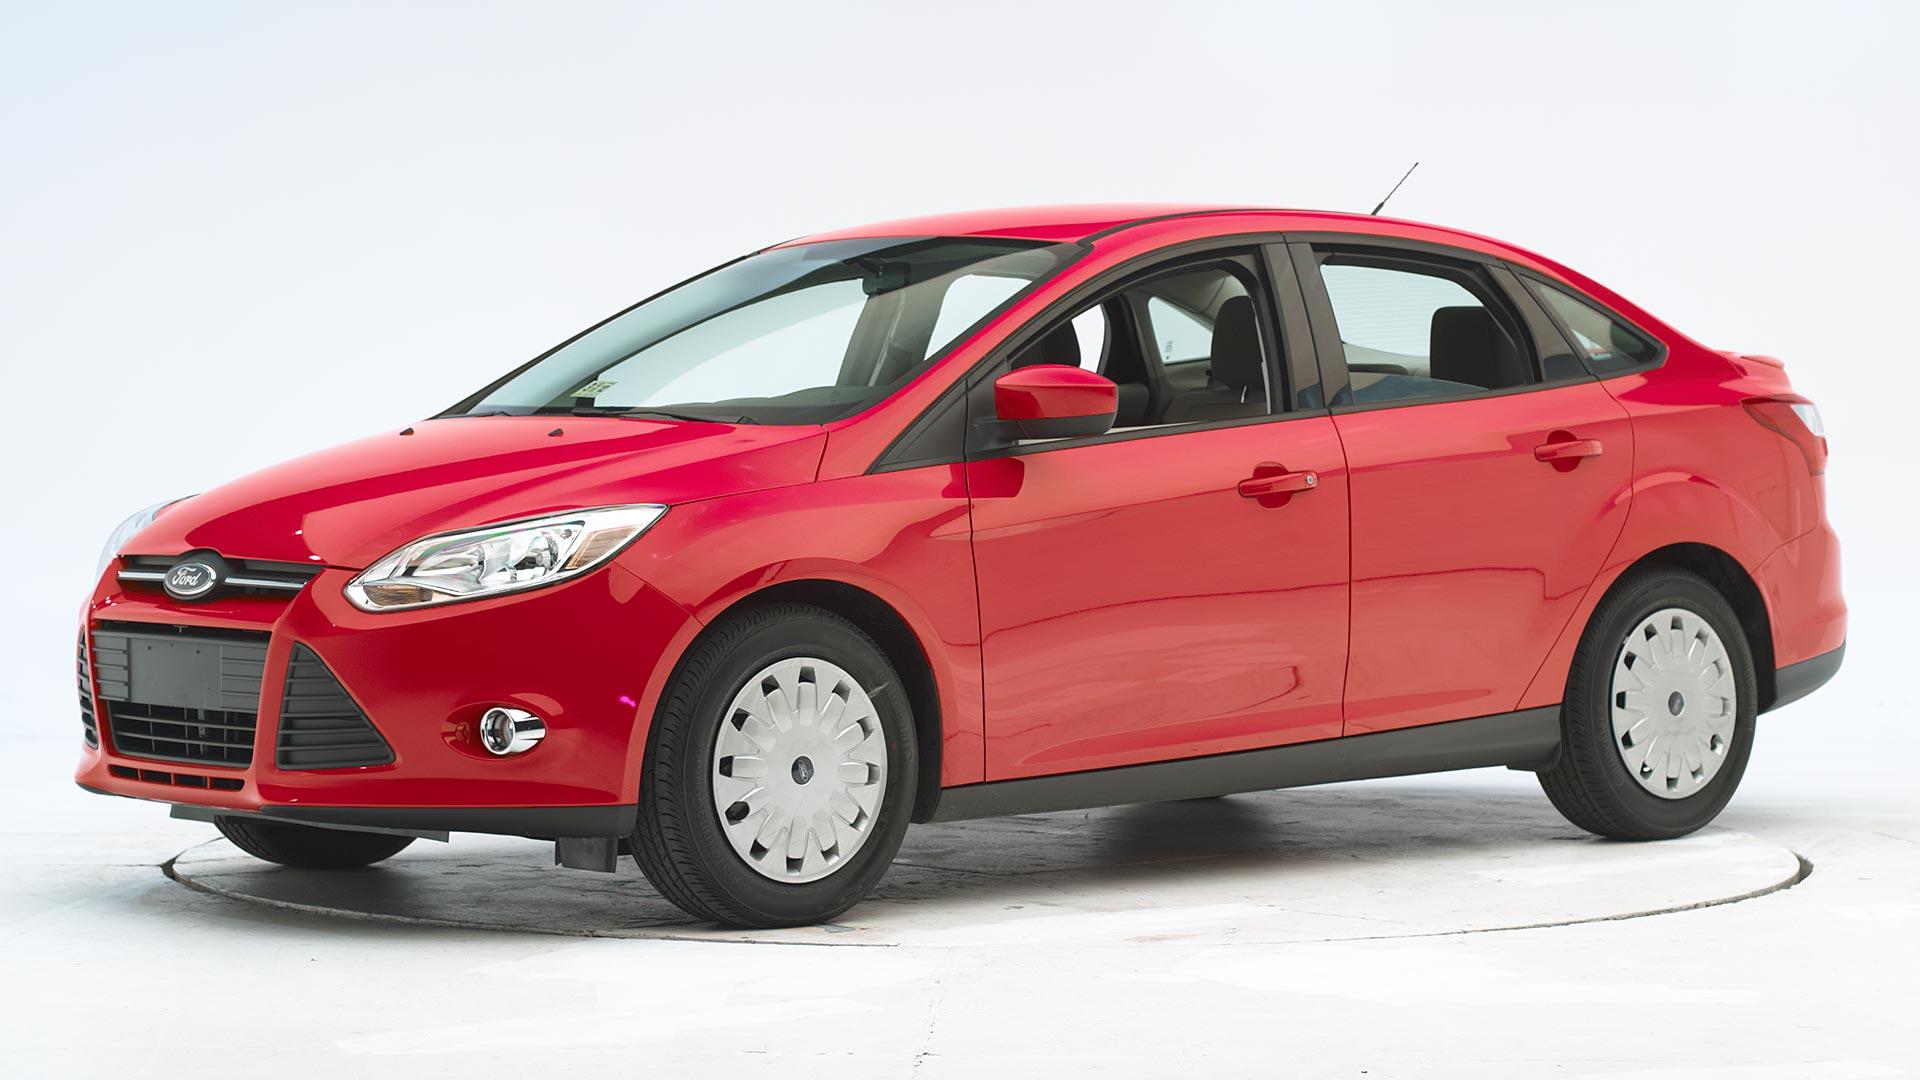 focus ford sedan door front safety crashworthiness driver side